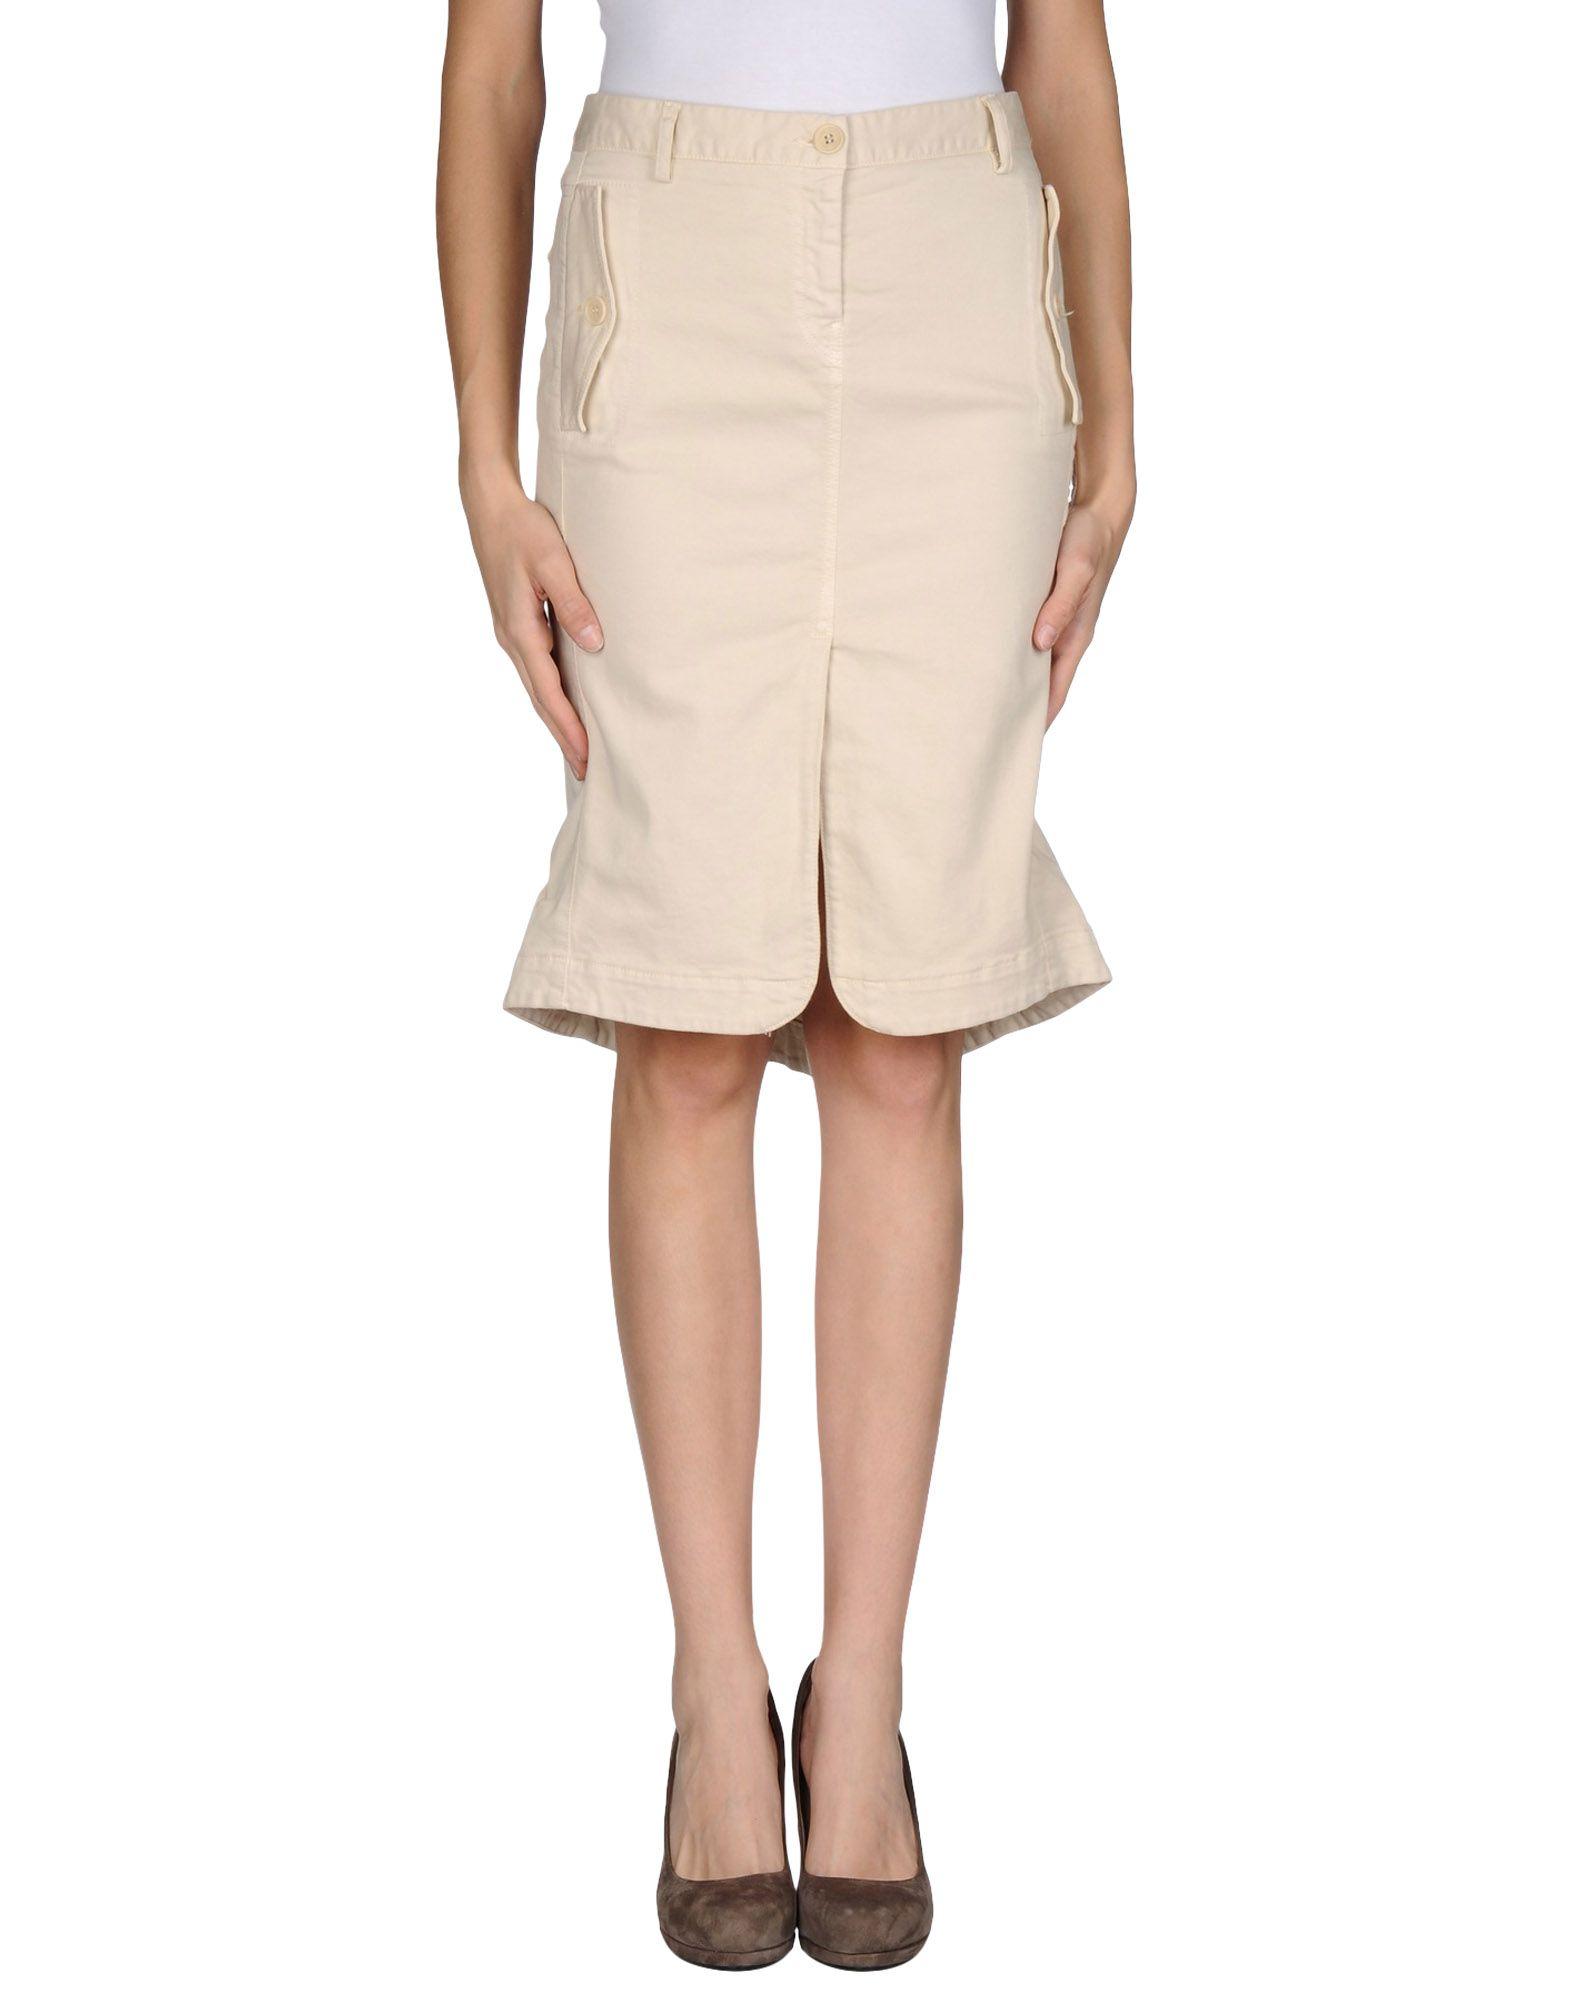 adele fado knee length skirt in beige save 66 lyst